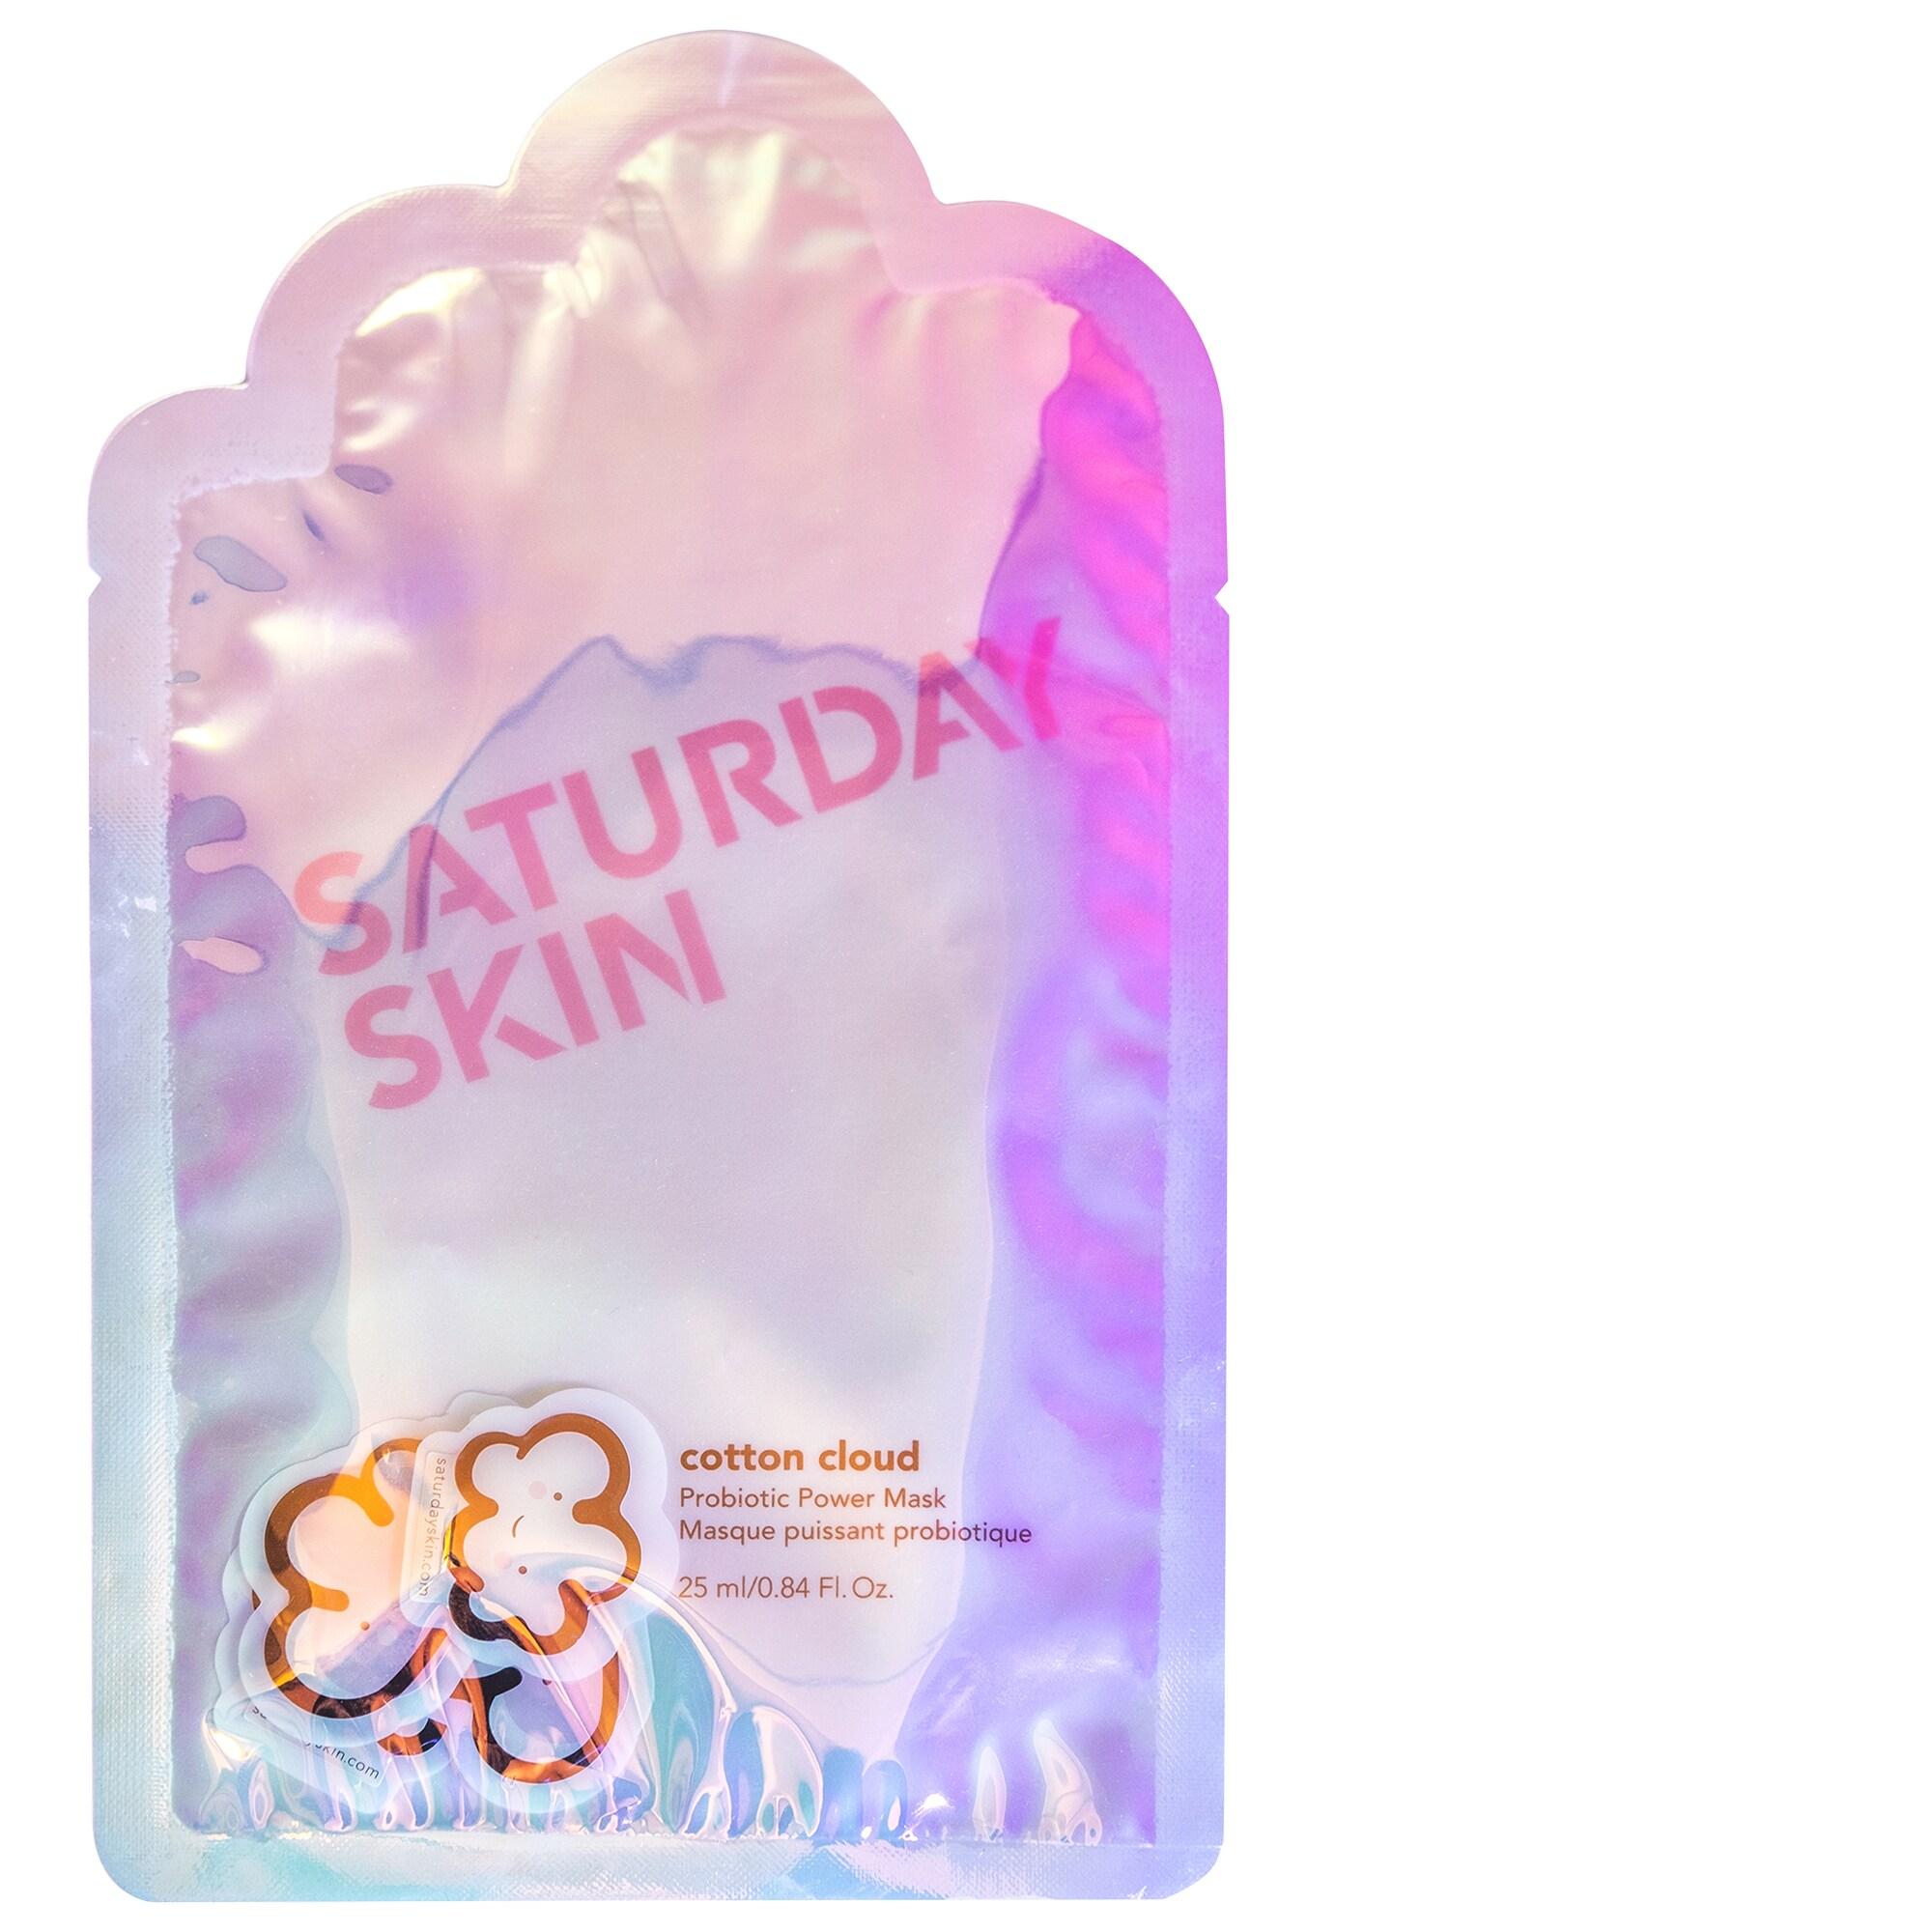 Saturday Skin - Cotton Cloud Probiotic Power Mask